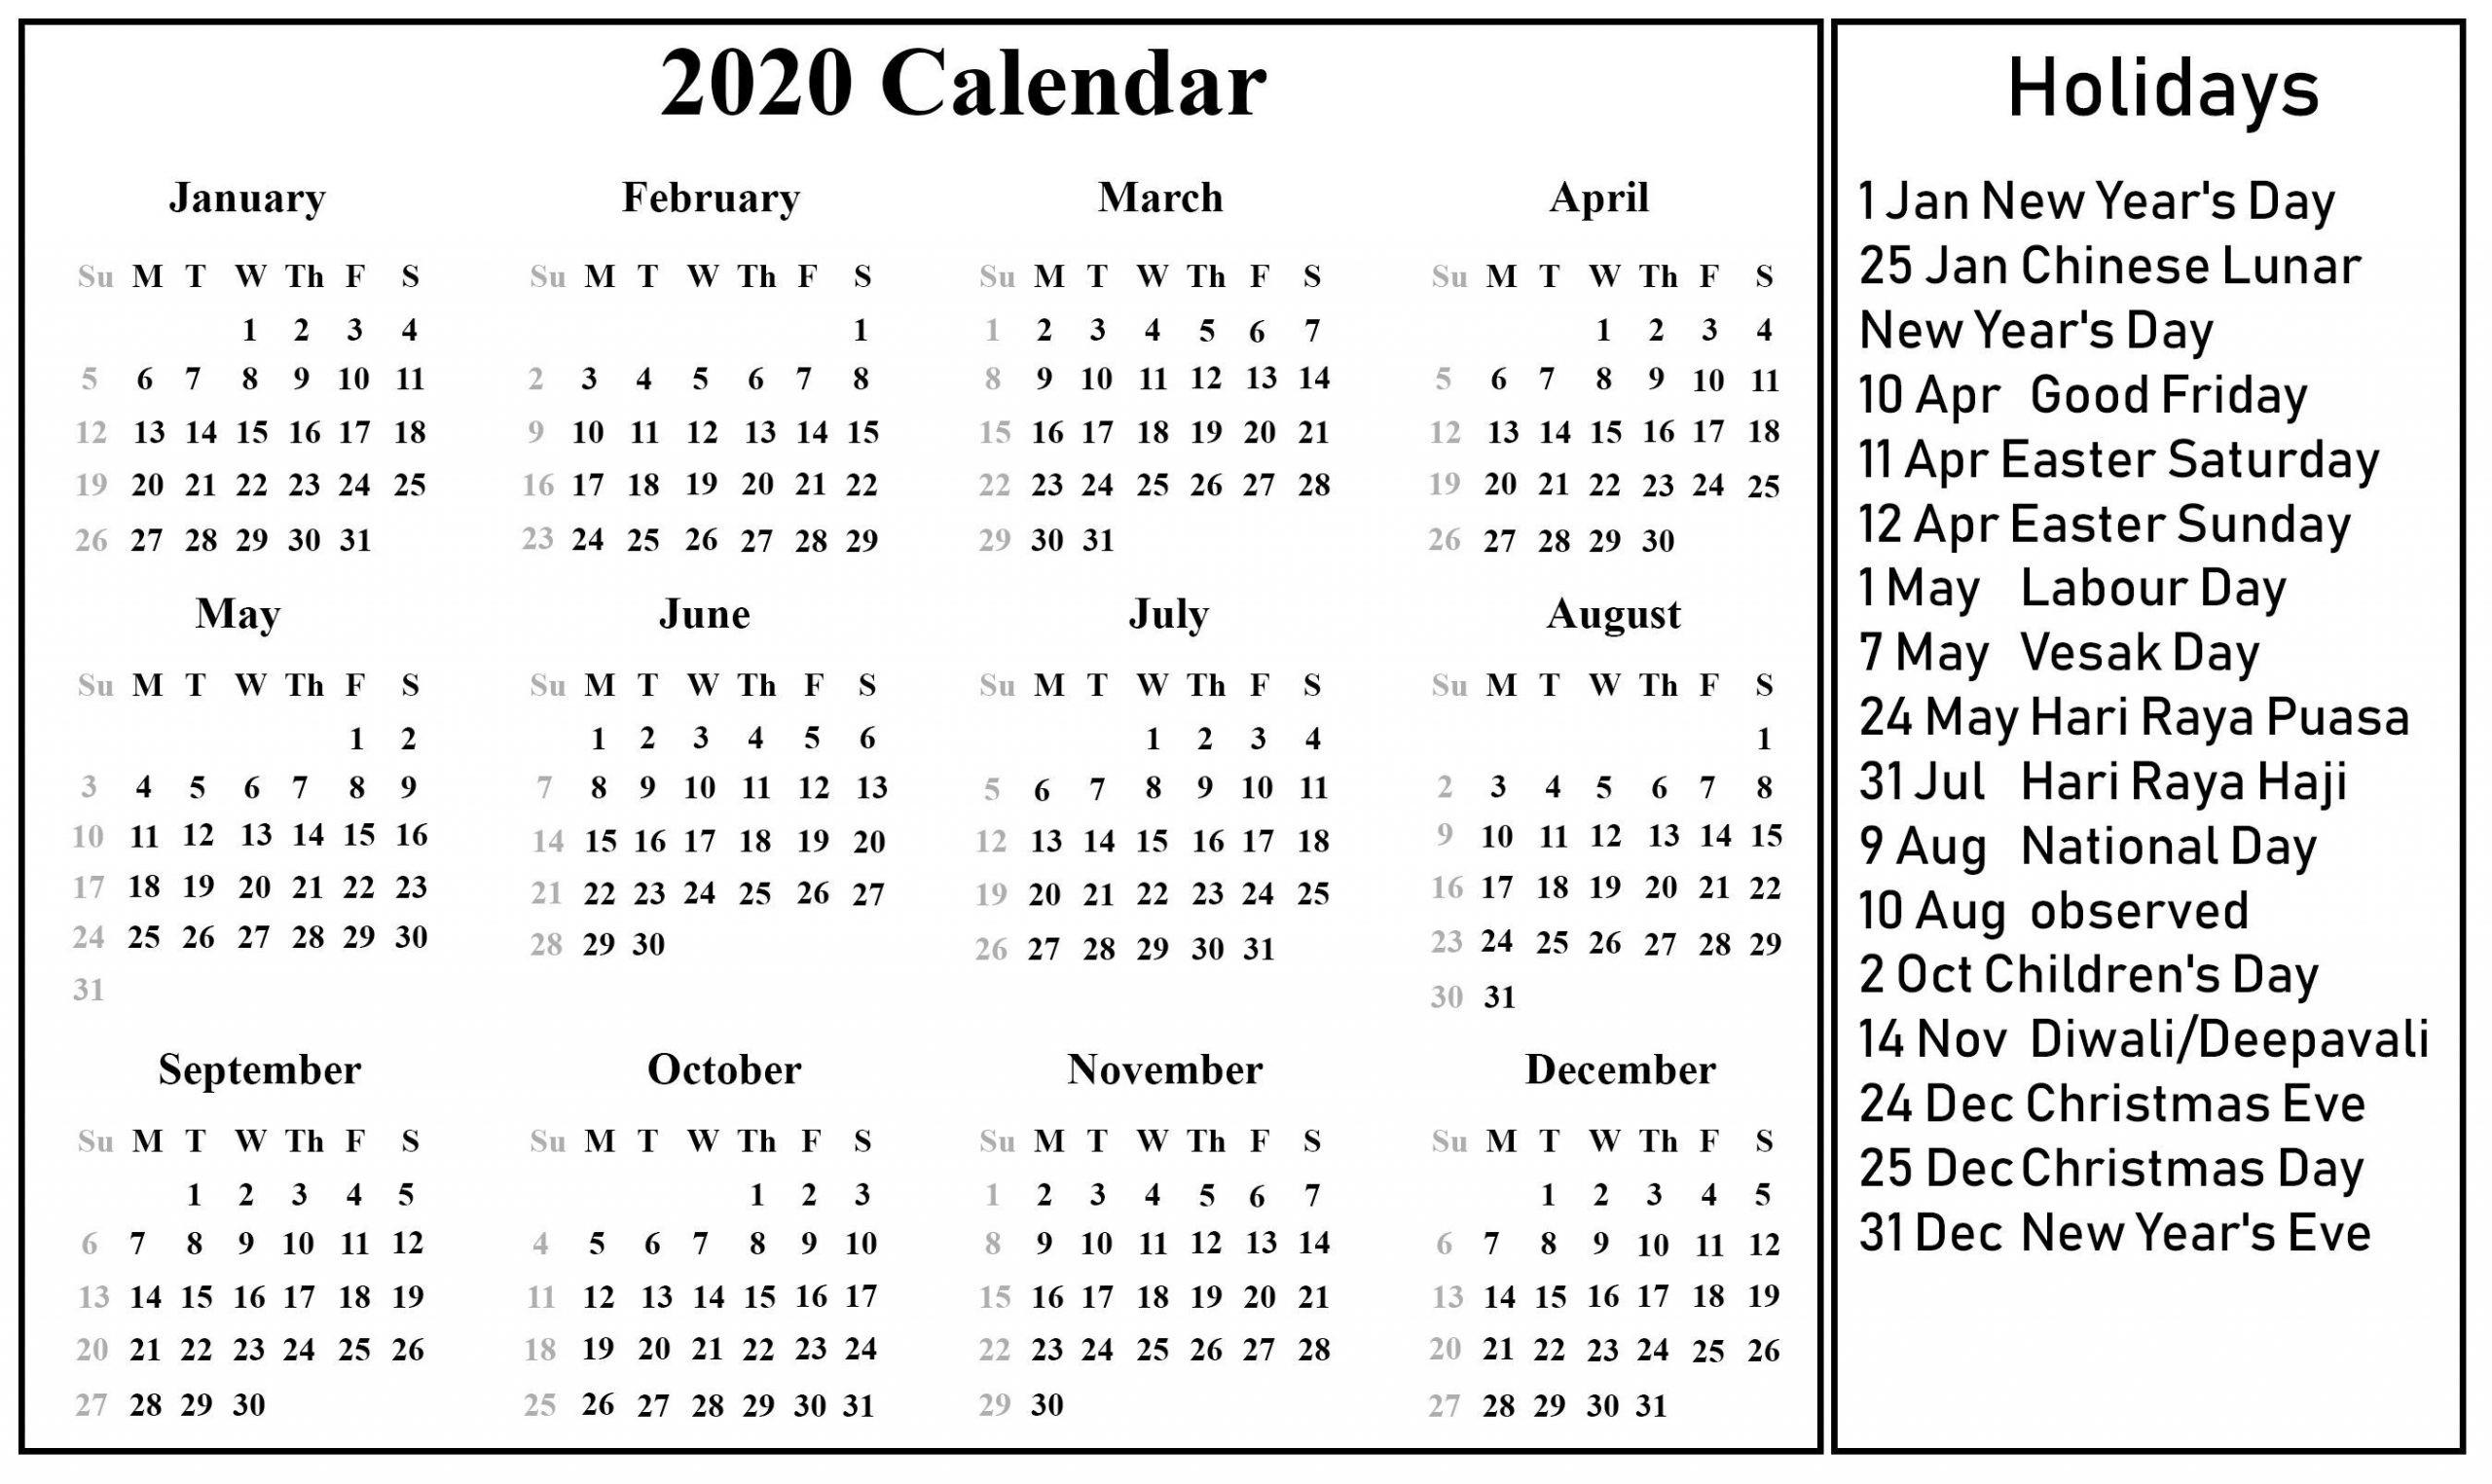 Mercantile Holidays 2021 Sri Lanka Gazet - Example  September Mercantile Holidays In Sri Lanka